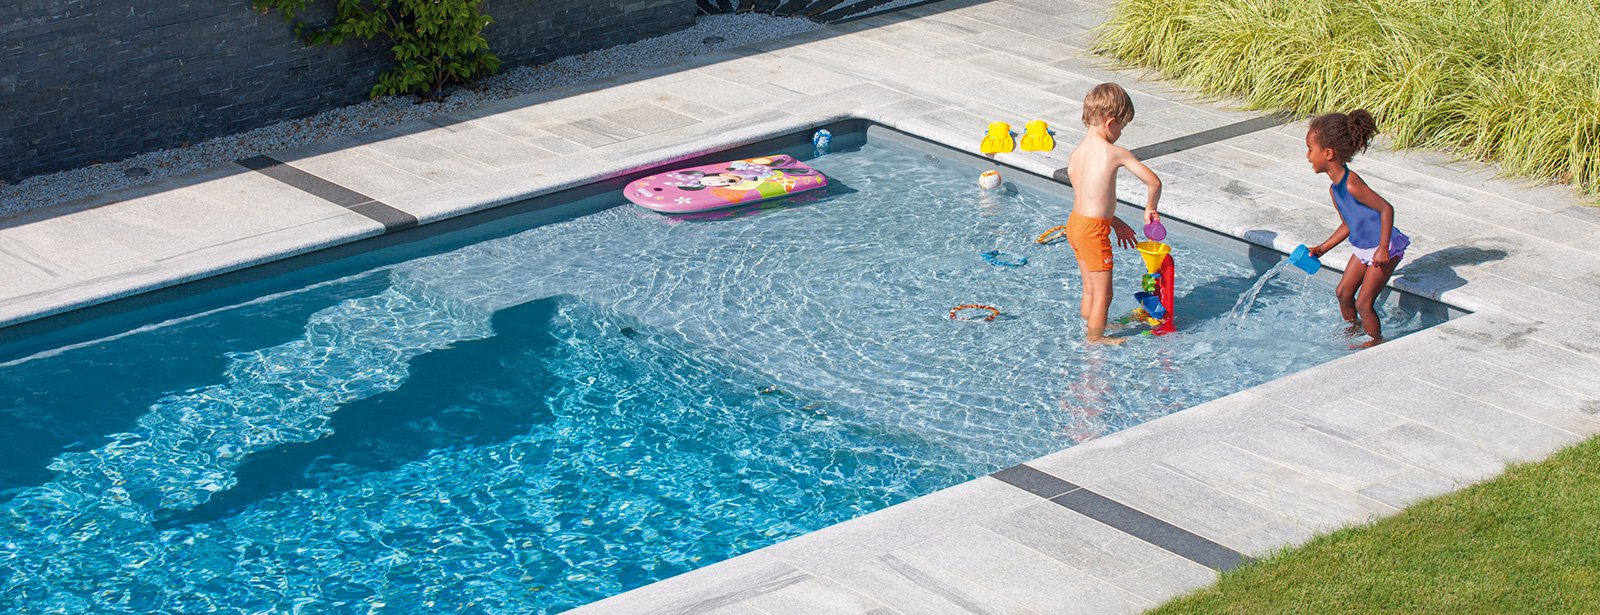 Riviera Pool D line zwembad